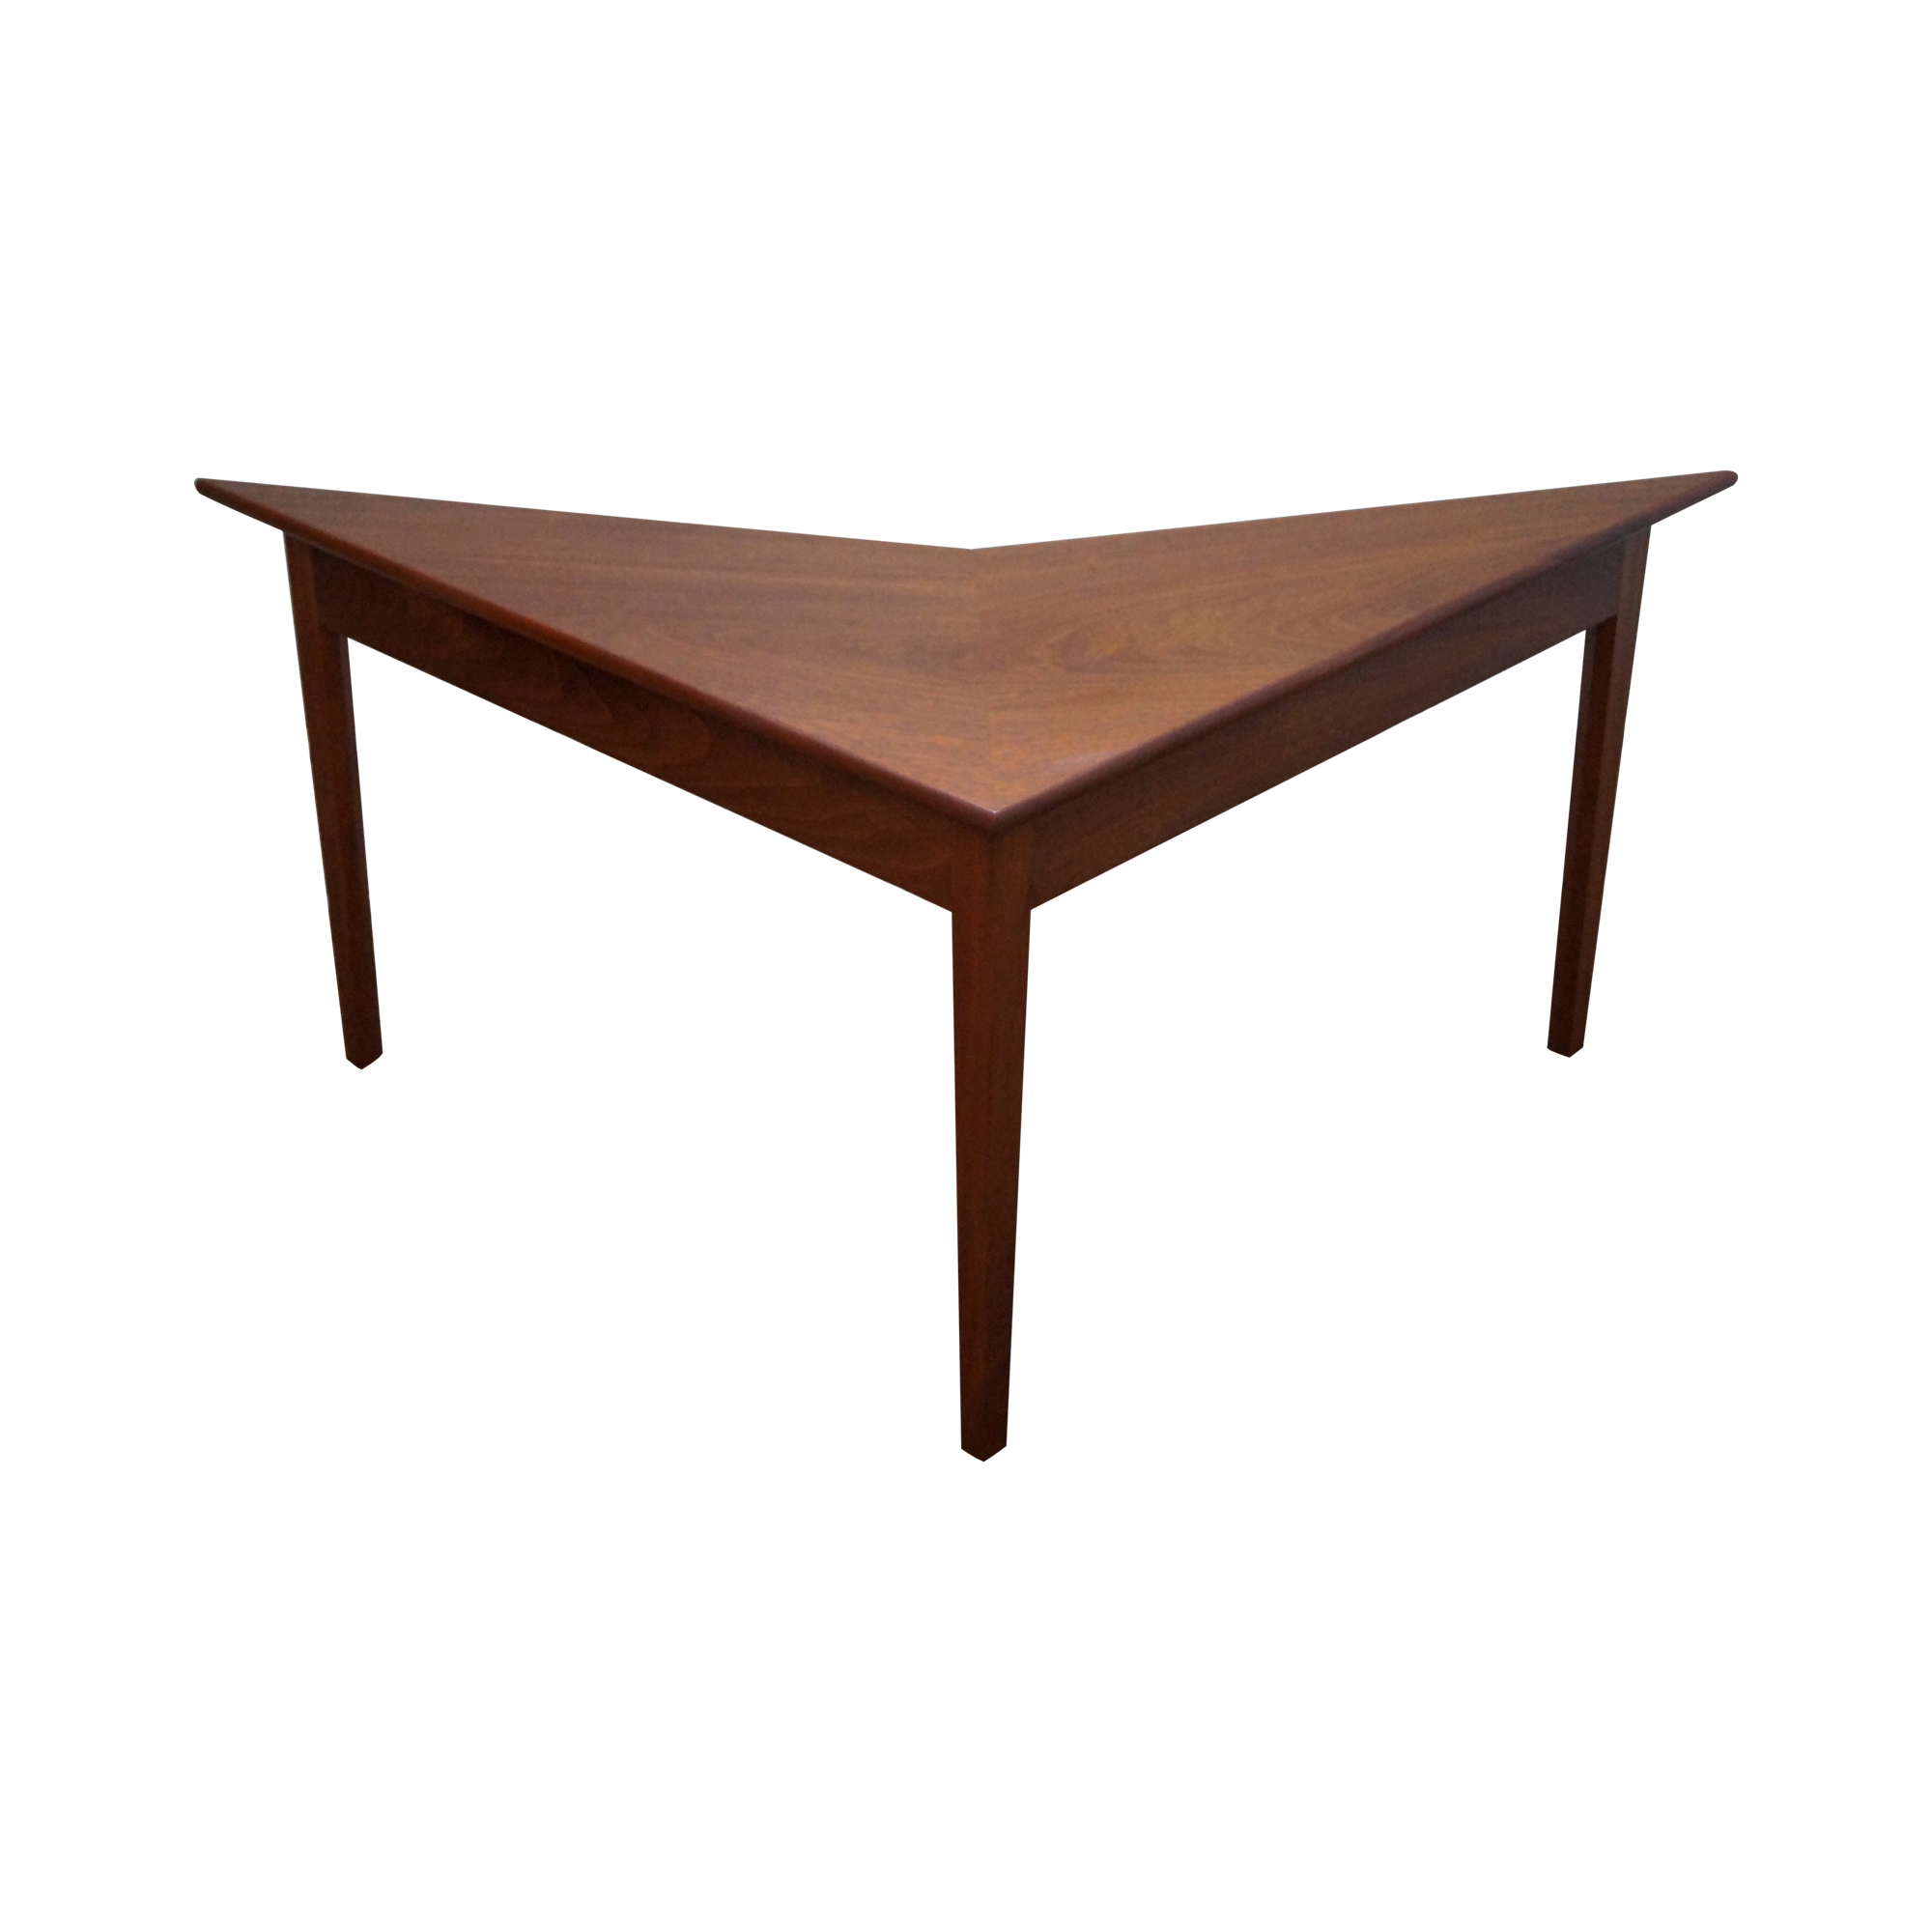 Mid Century Modern Studio Made Triangle Low Table Chairish : mid century modern studio made triangle low table 2261 from www.chairish.com size 2000 x 2000 png 618kB